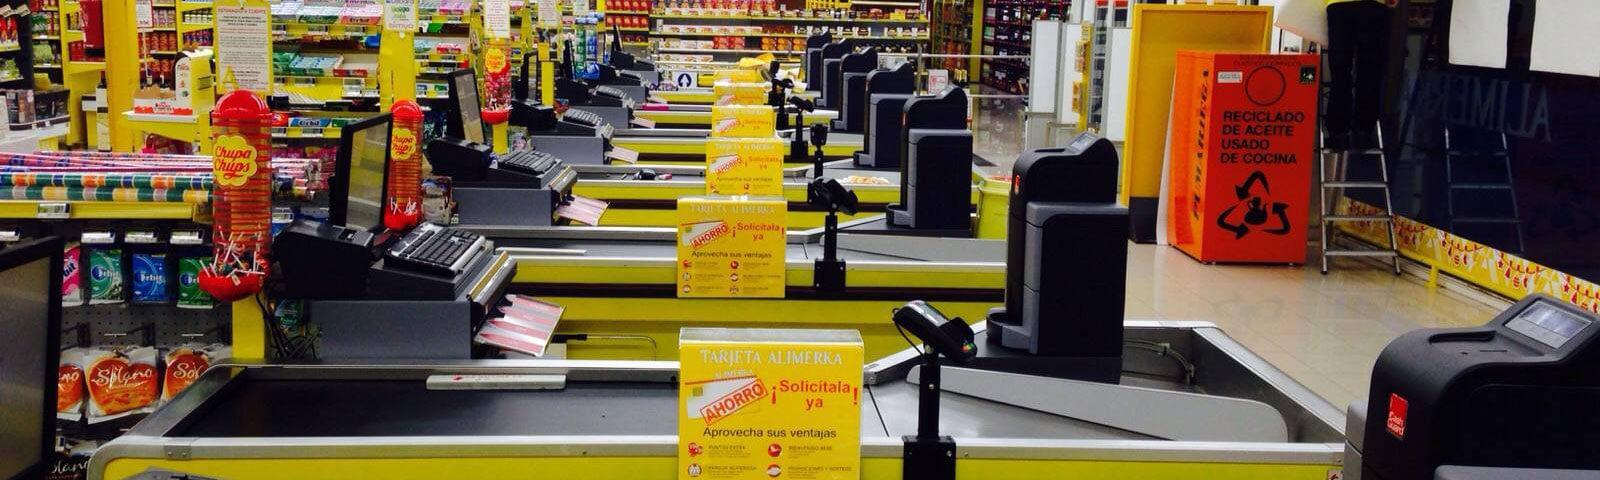 Sectores de negocio Telsystem: Supermercados